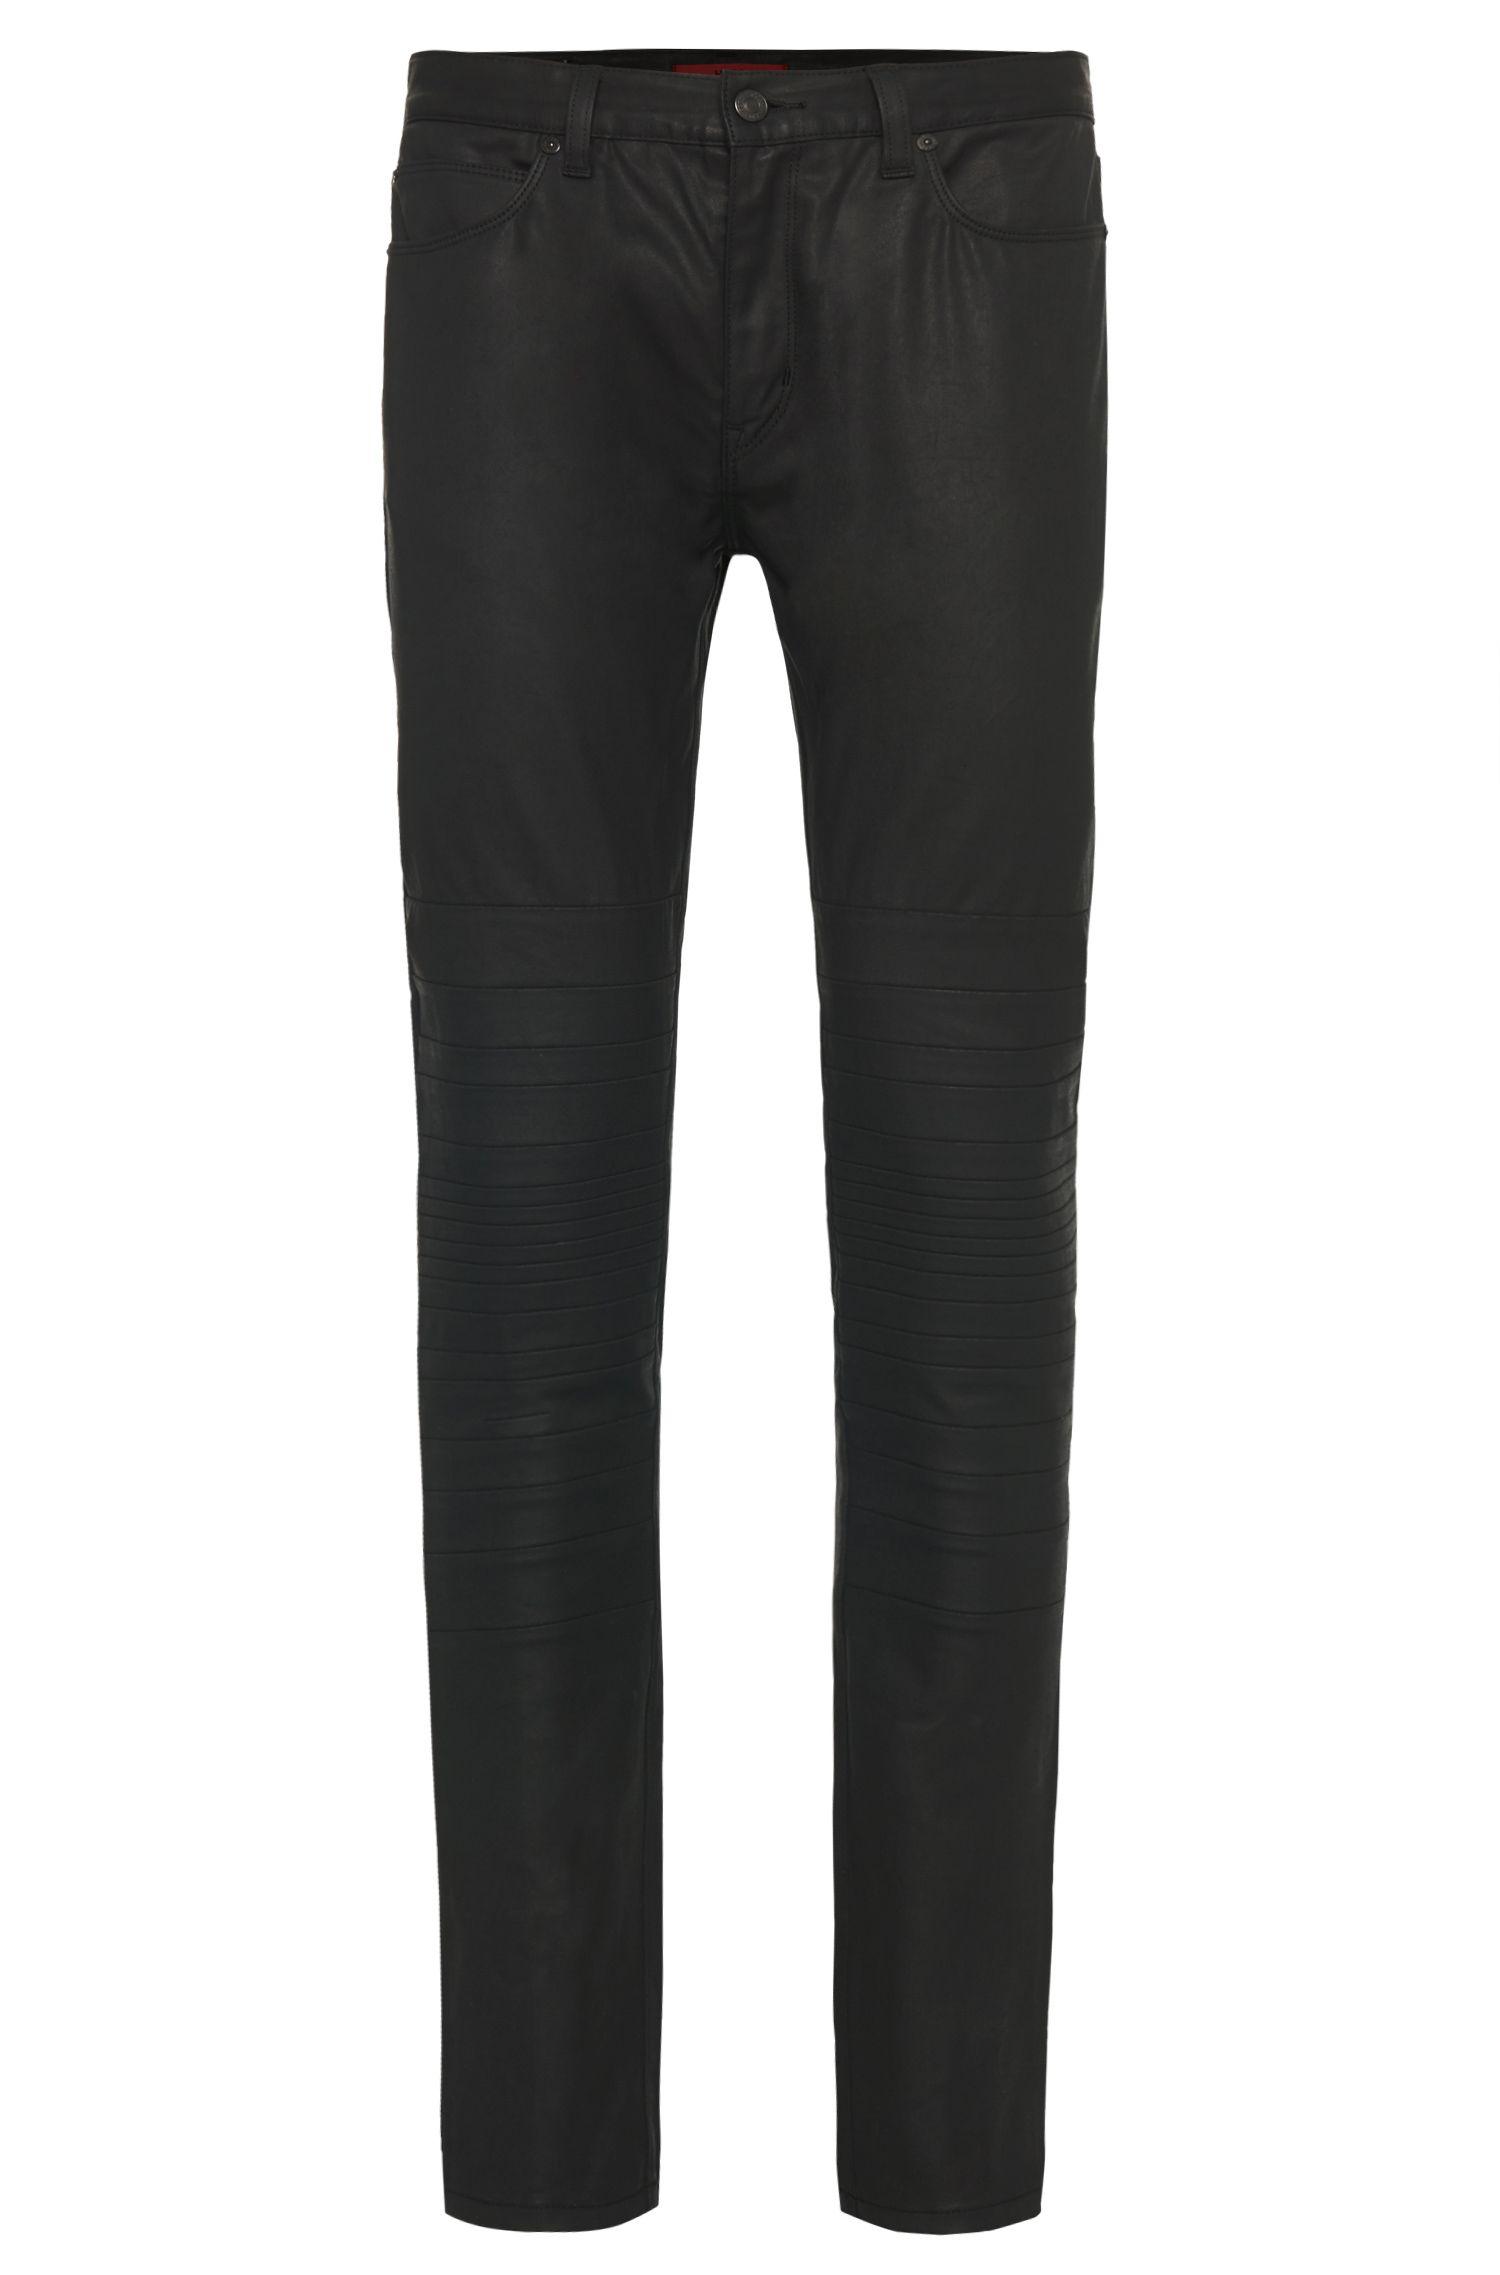 'HUGO 734/30' | Skinny Fit, 12.5 oz Stretch Cotton Coated Jeans